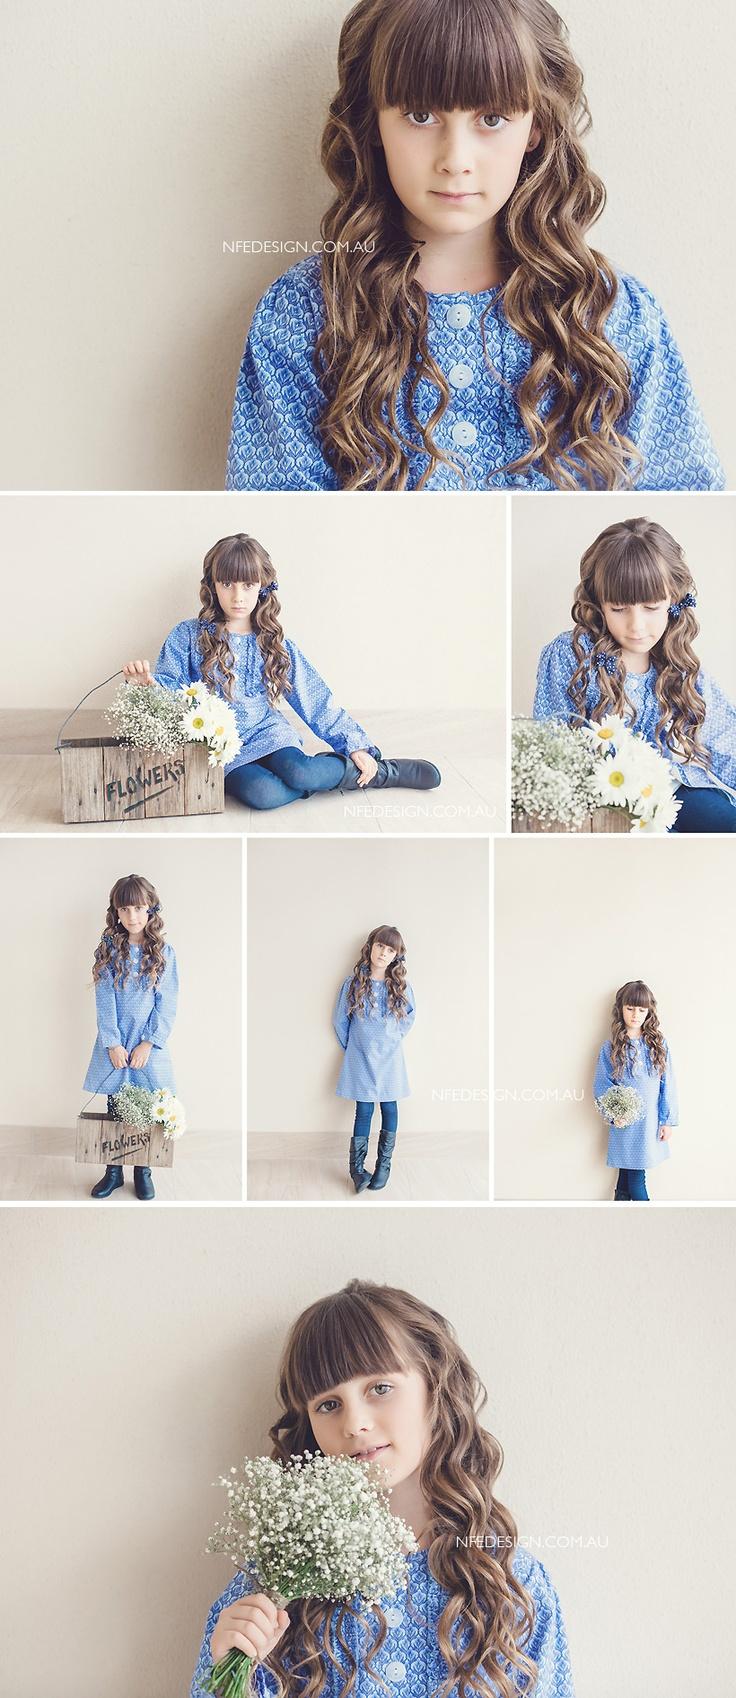 sacha felur de lys girls dress  from Juliets closet (@Megan King)  photography by NFE Design ~ more pics here http://nfedesign.com.au/blog/2012/04/juliets-closet-sacha-fleur-de-lys/  flowers by Sapphire designs @Rach Bellwood